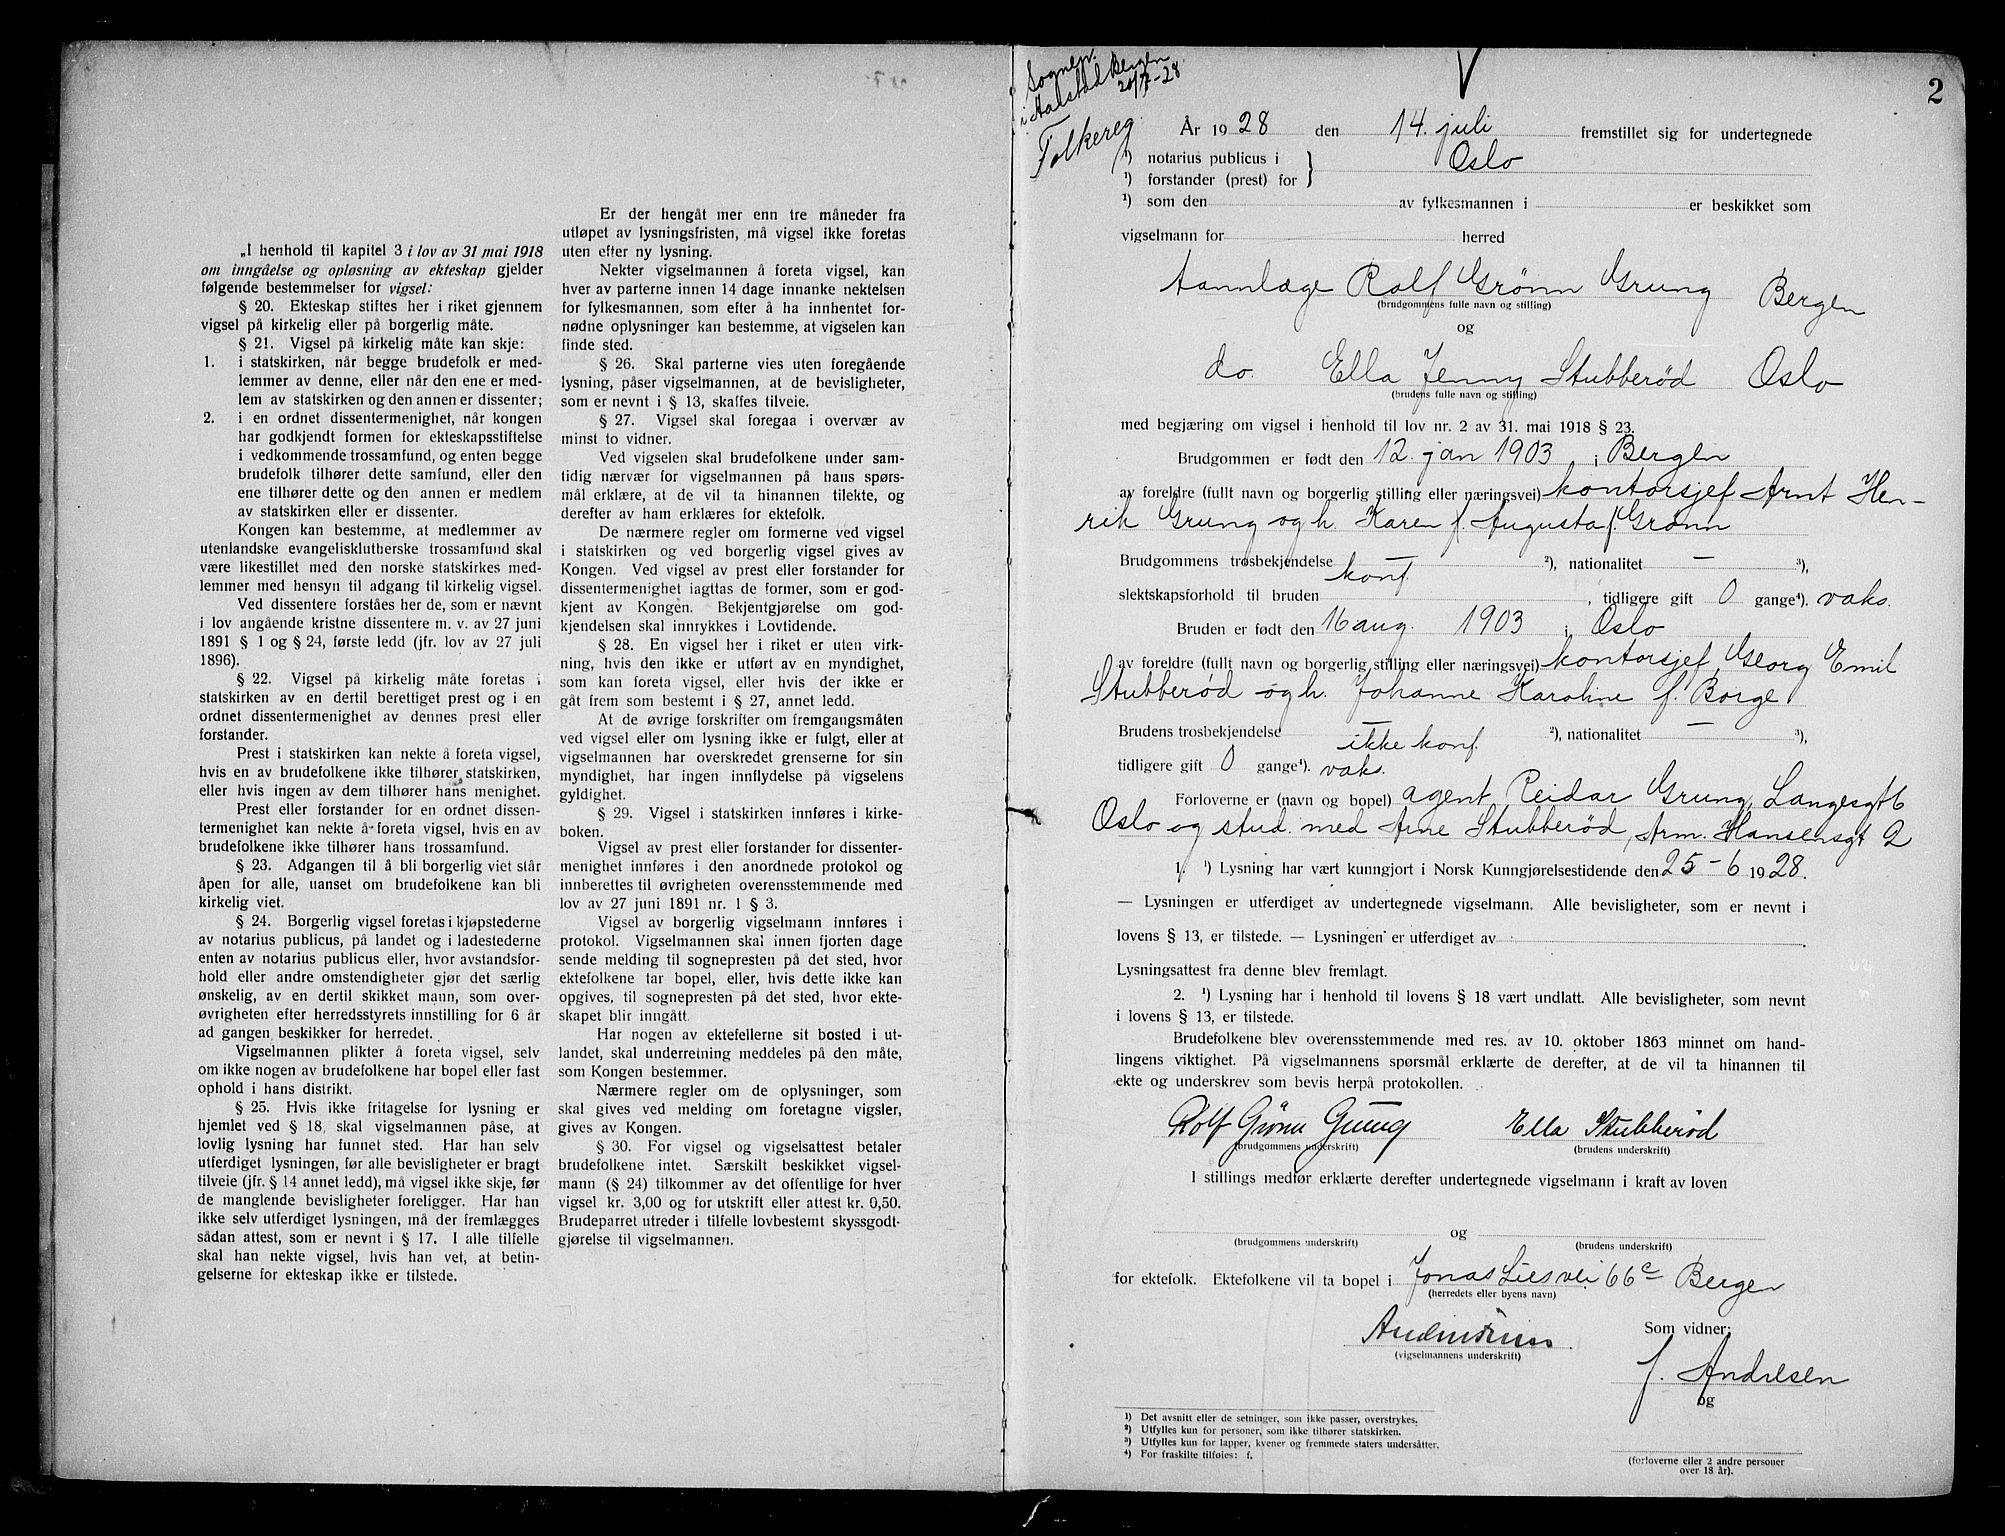 SAO, Oslo byfogd avd. I, L/Lb/Lbb/L0019: Notarialprotokoll, rekke II: Vigsler, 1928-1929, s. 1b-2a